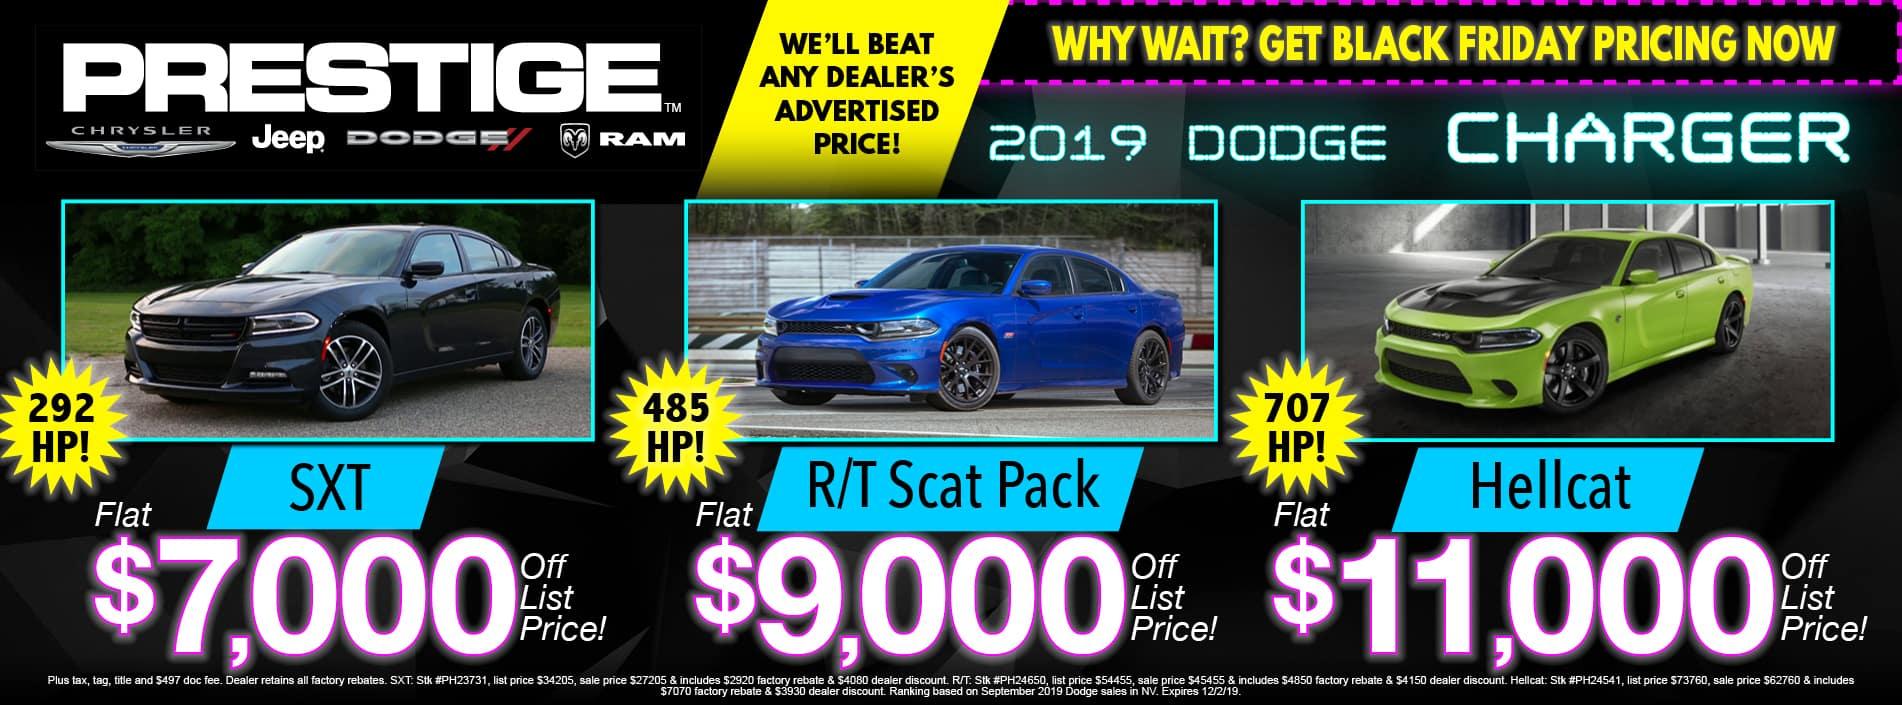 Jeep Dealership Las Vegas >> Dodge Dealership Las Vegas New Car Reviews 2020